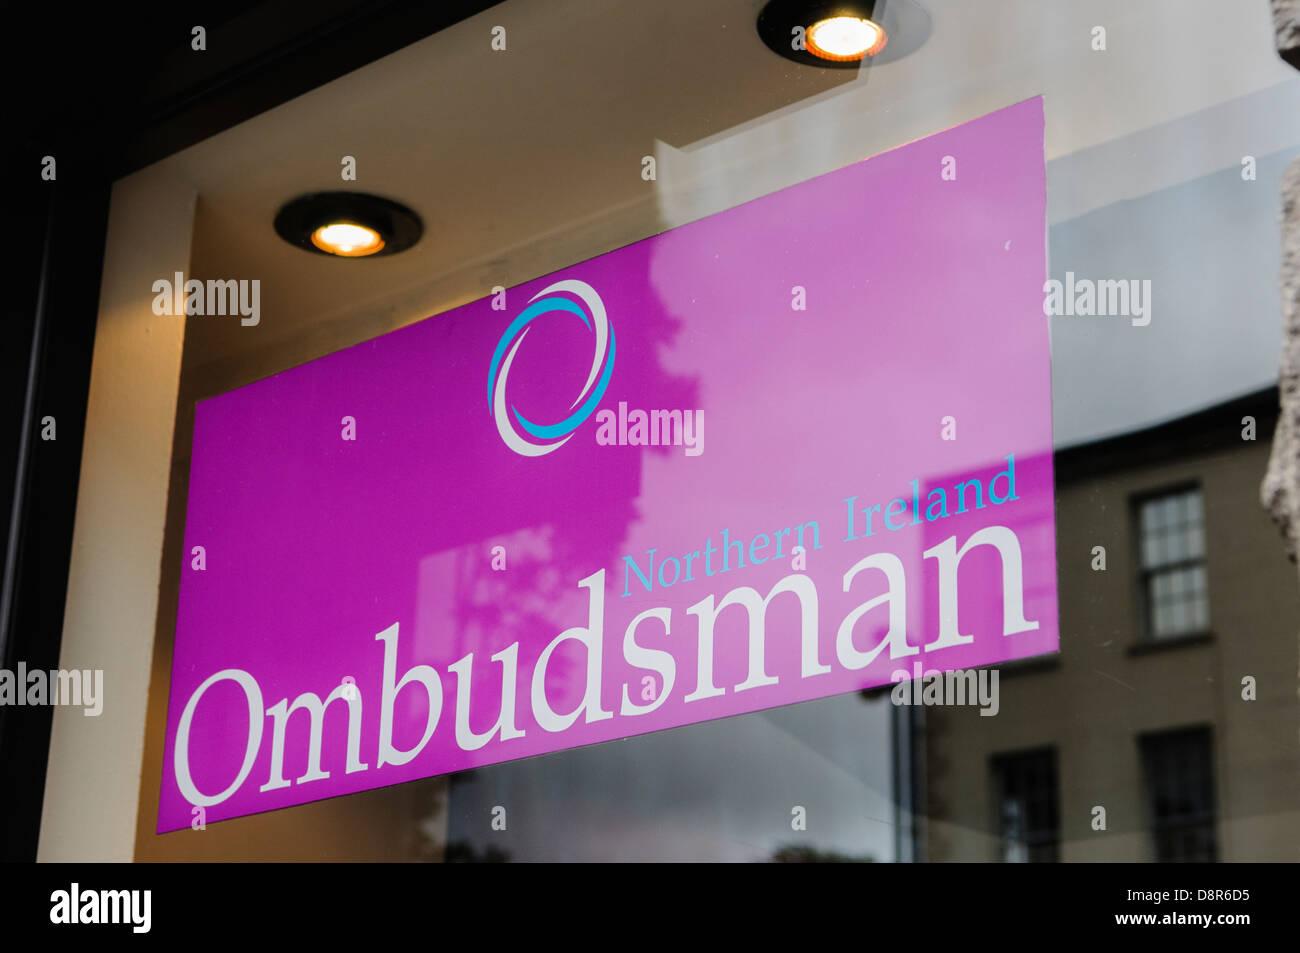 Northern Ireland Ombudsman. - Stock Image